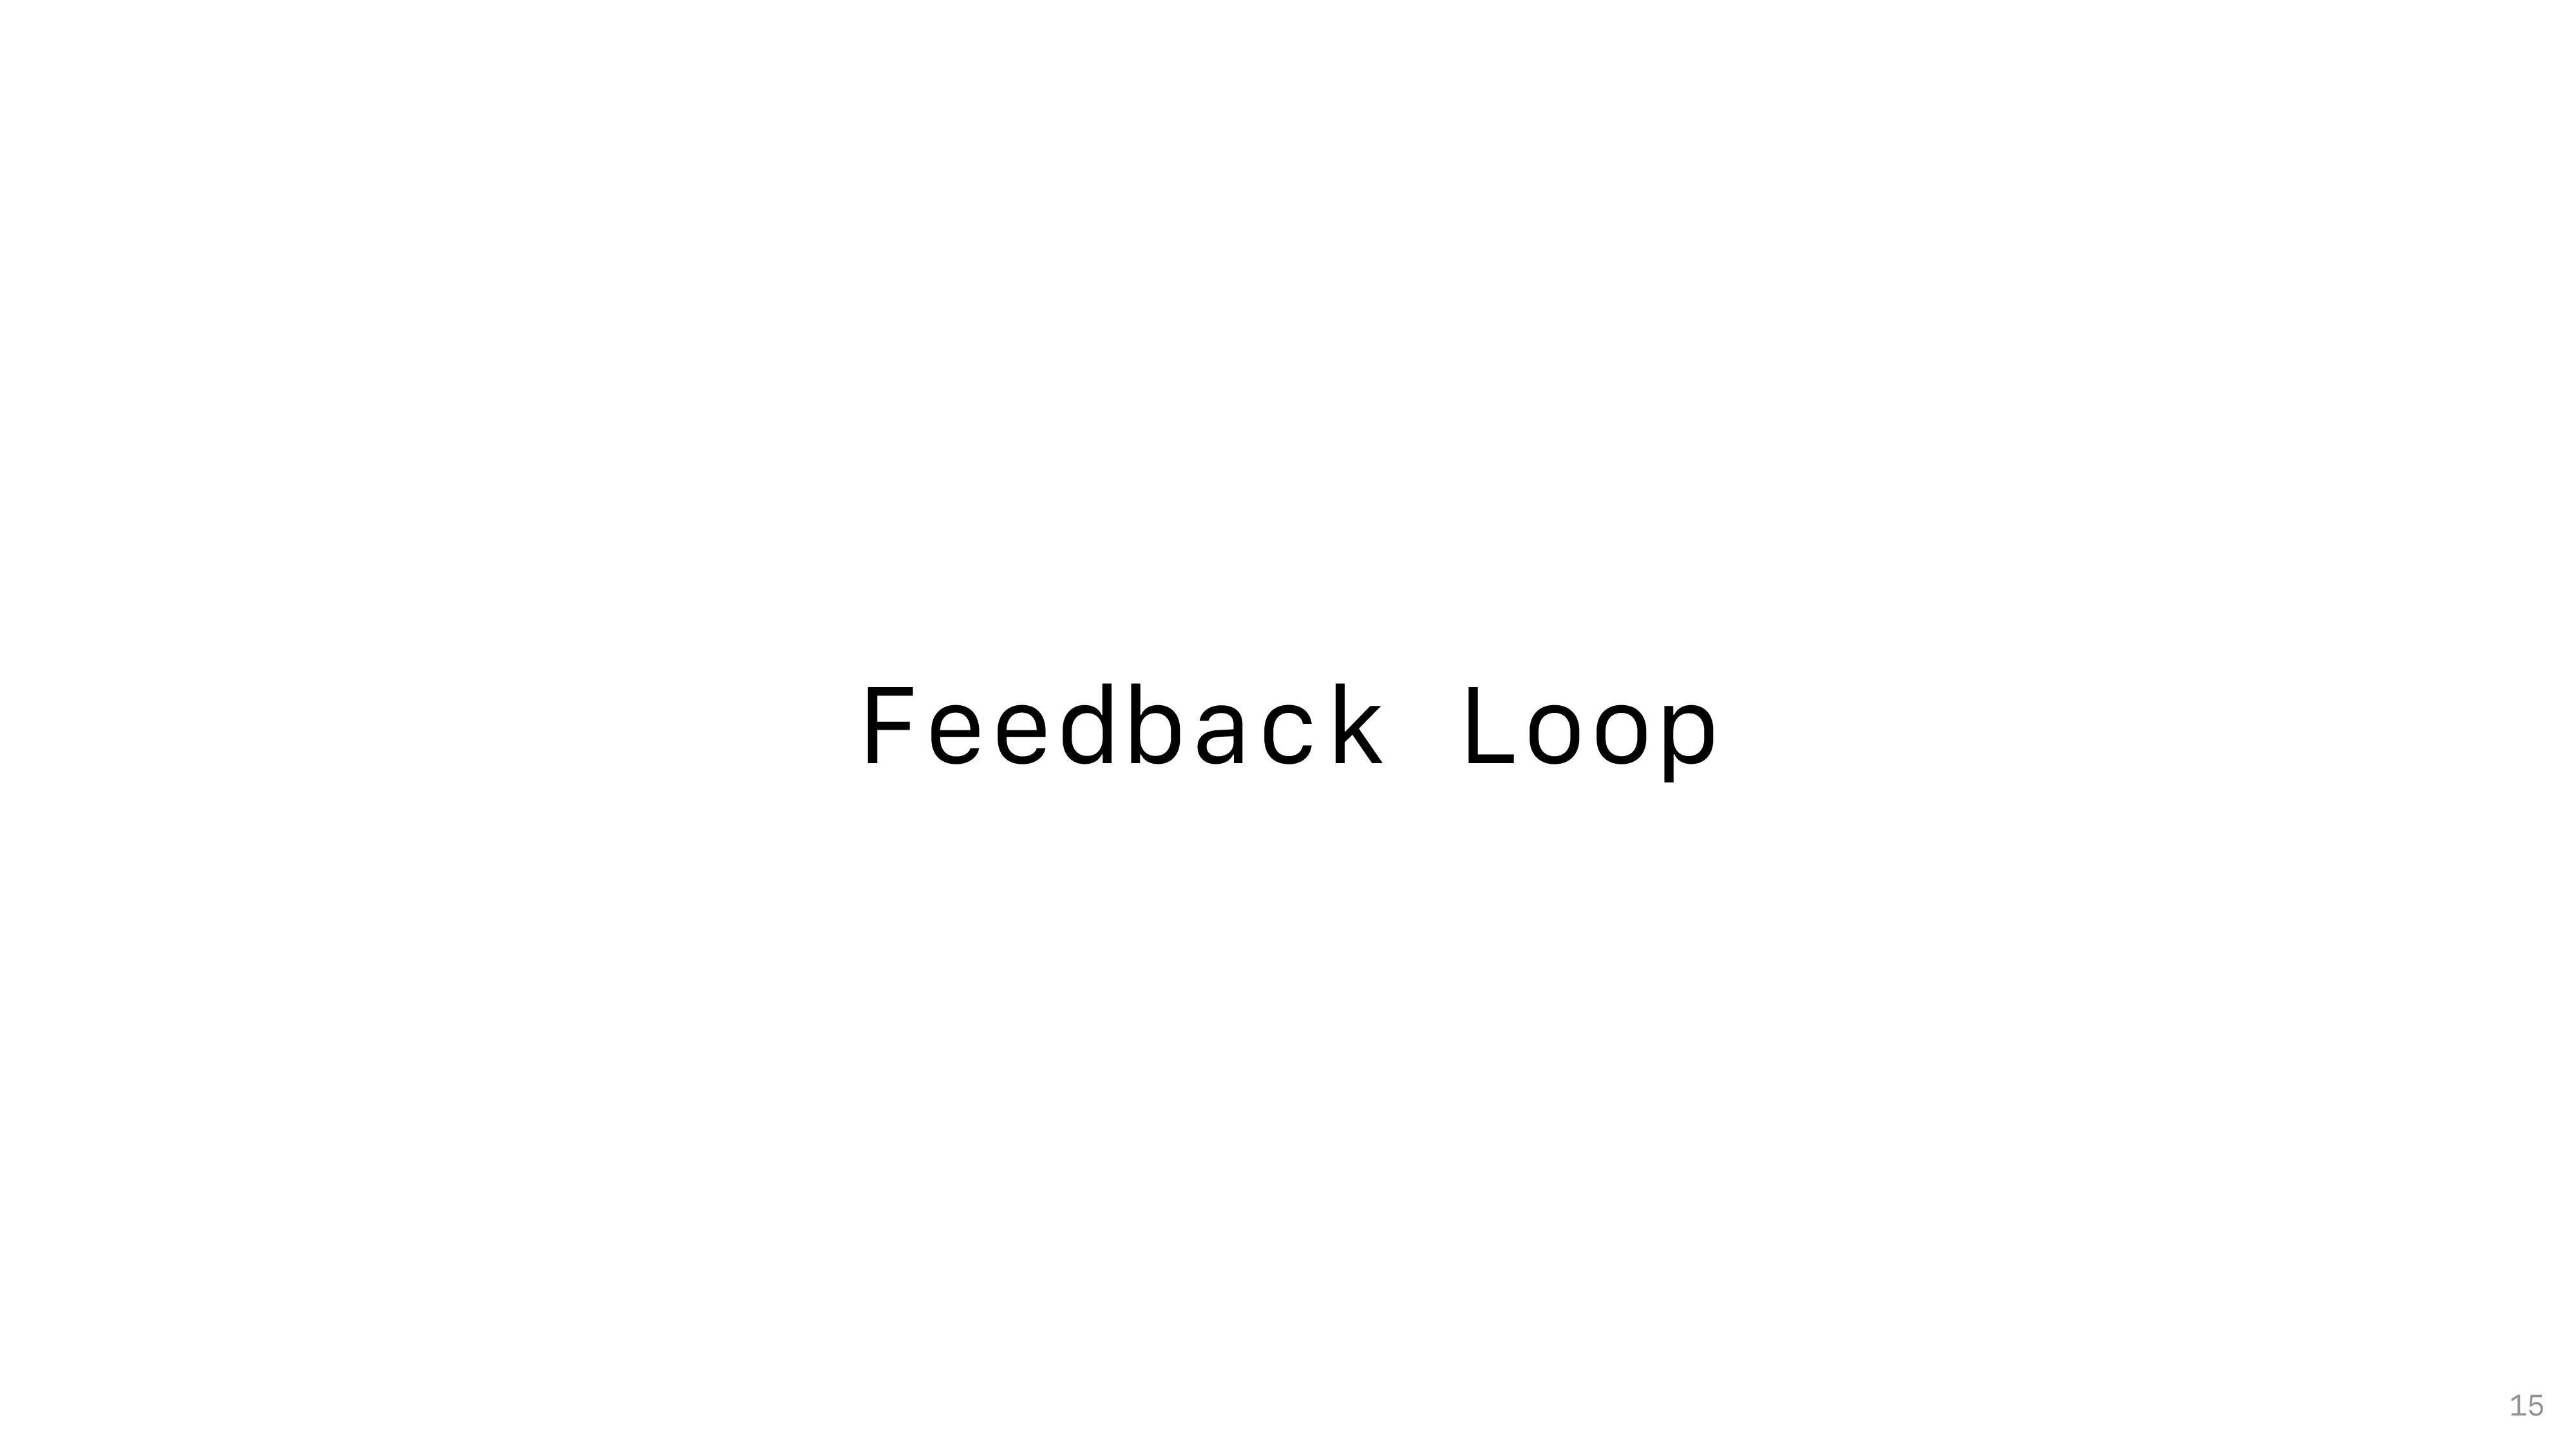 Feedback Loop 15